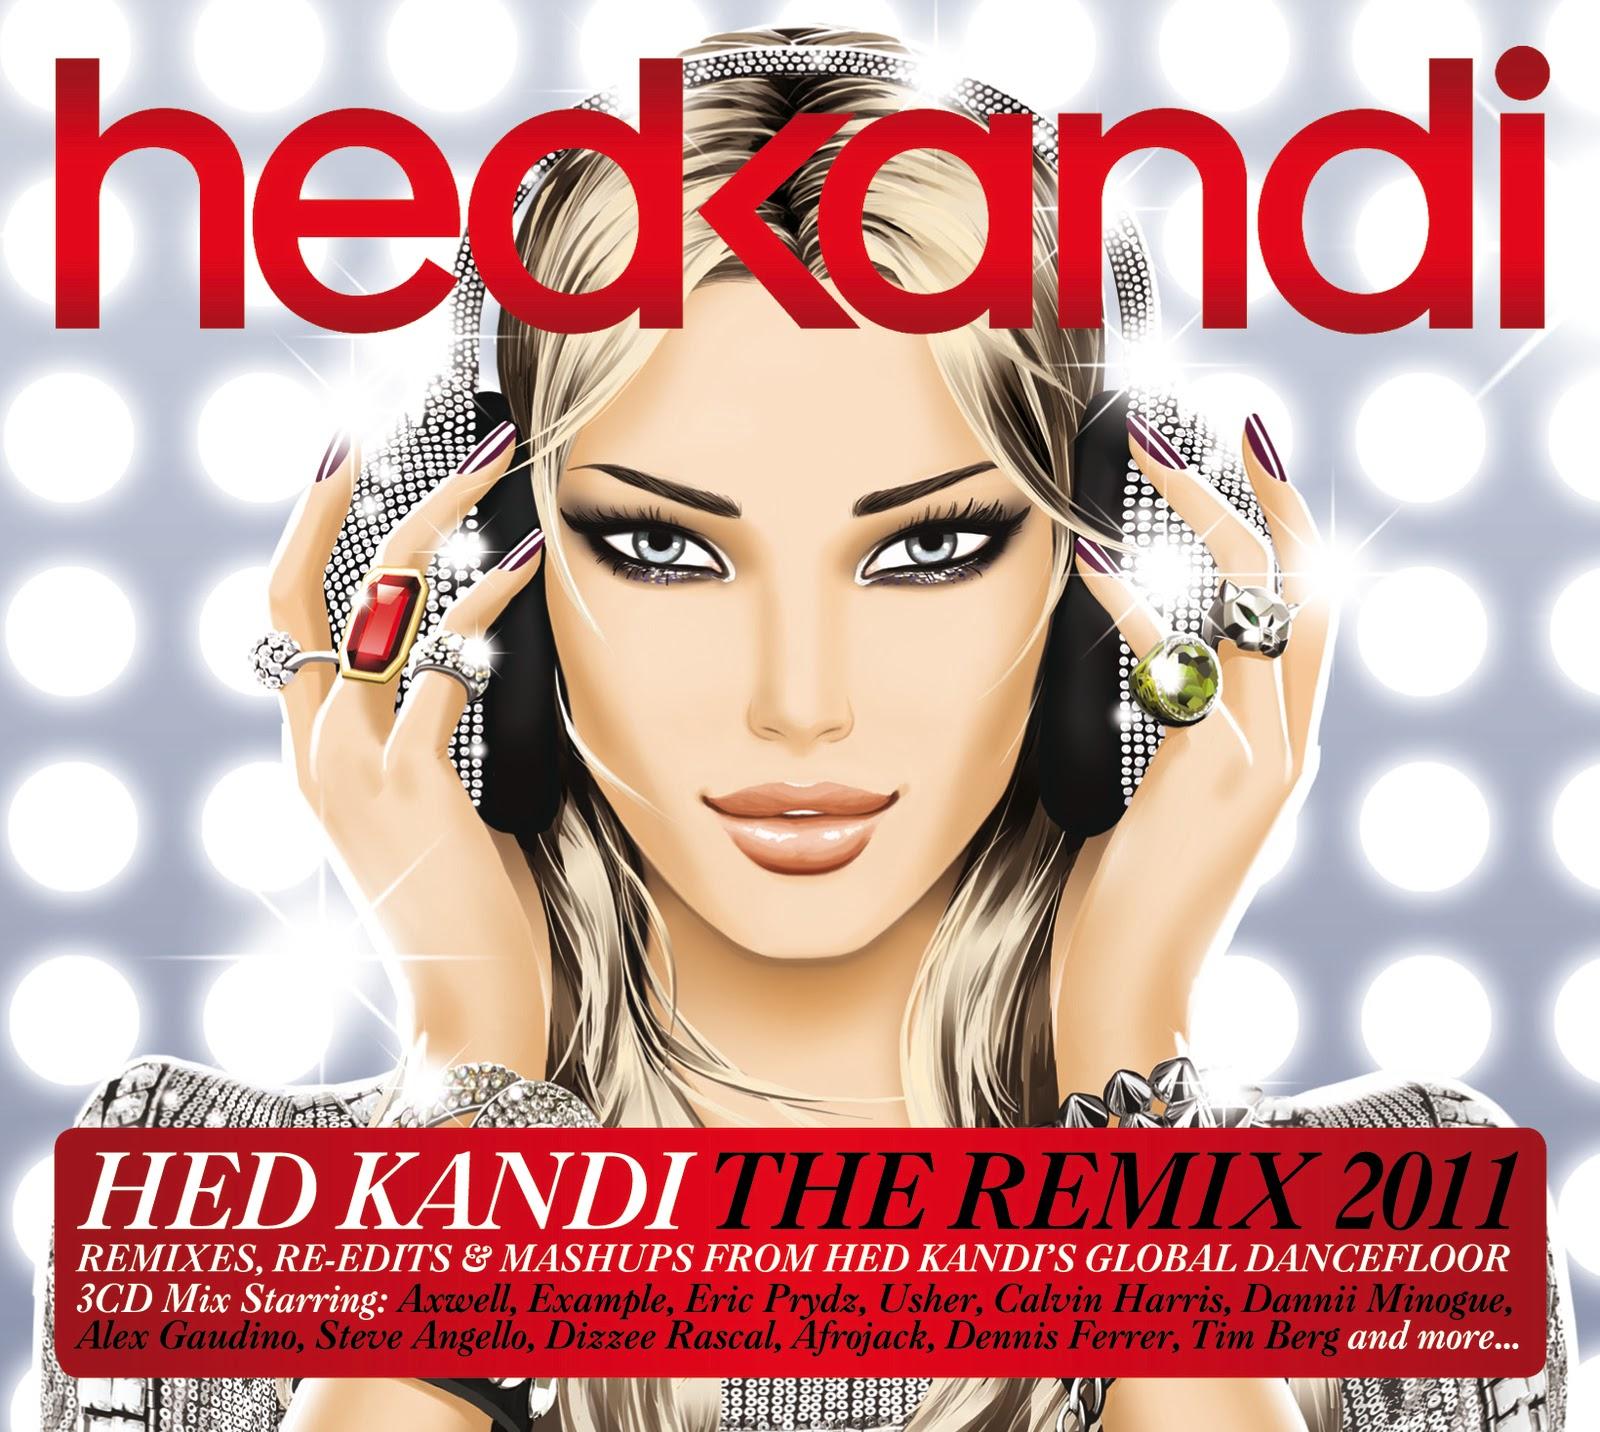 http://2.bp.blogspot.com/_VBWYS49PYAY/TPAr1x2xi4I/AAAAAAAAAFo/x5Z_pm0TThA/s1600/hedk105-the-remix.jpg